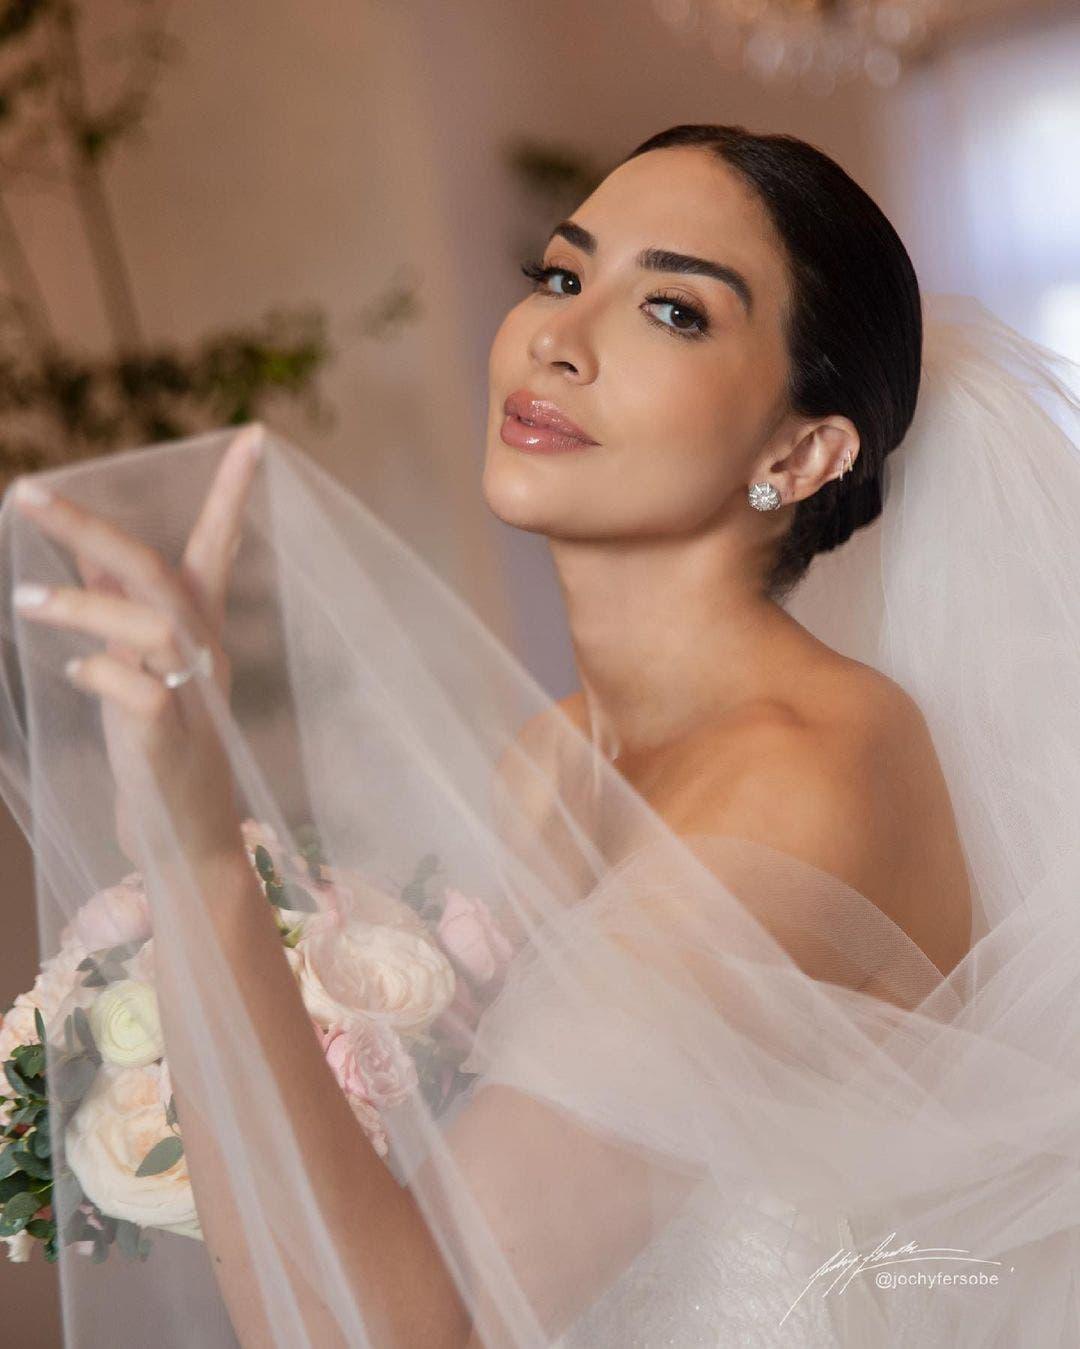 Fotos: Así lució Gabi Desangles su vestido de novia